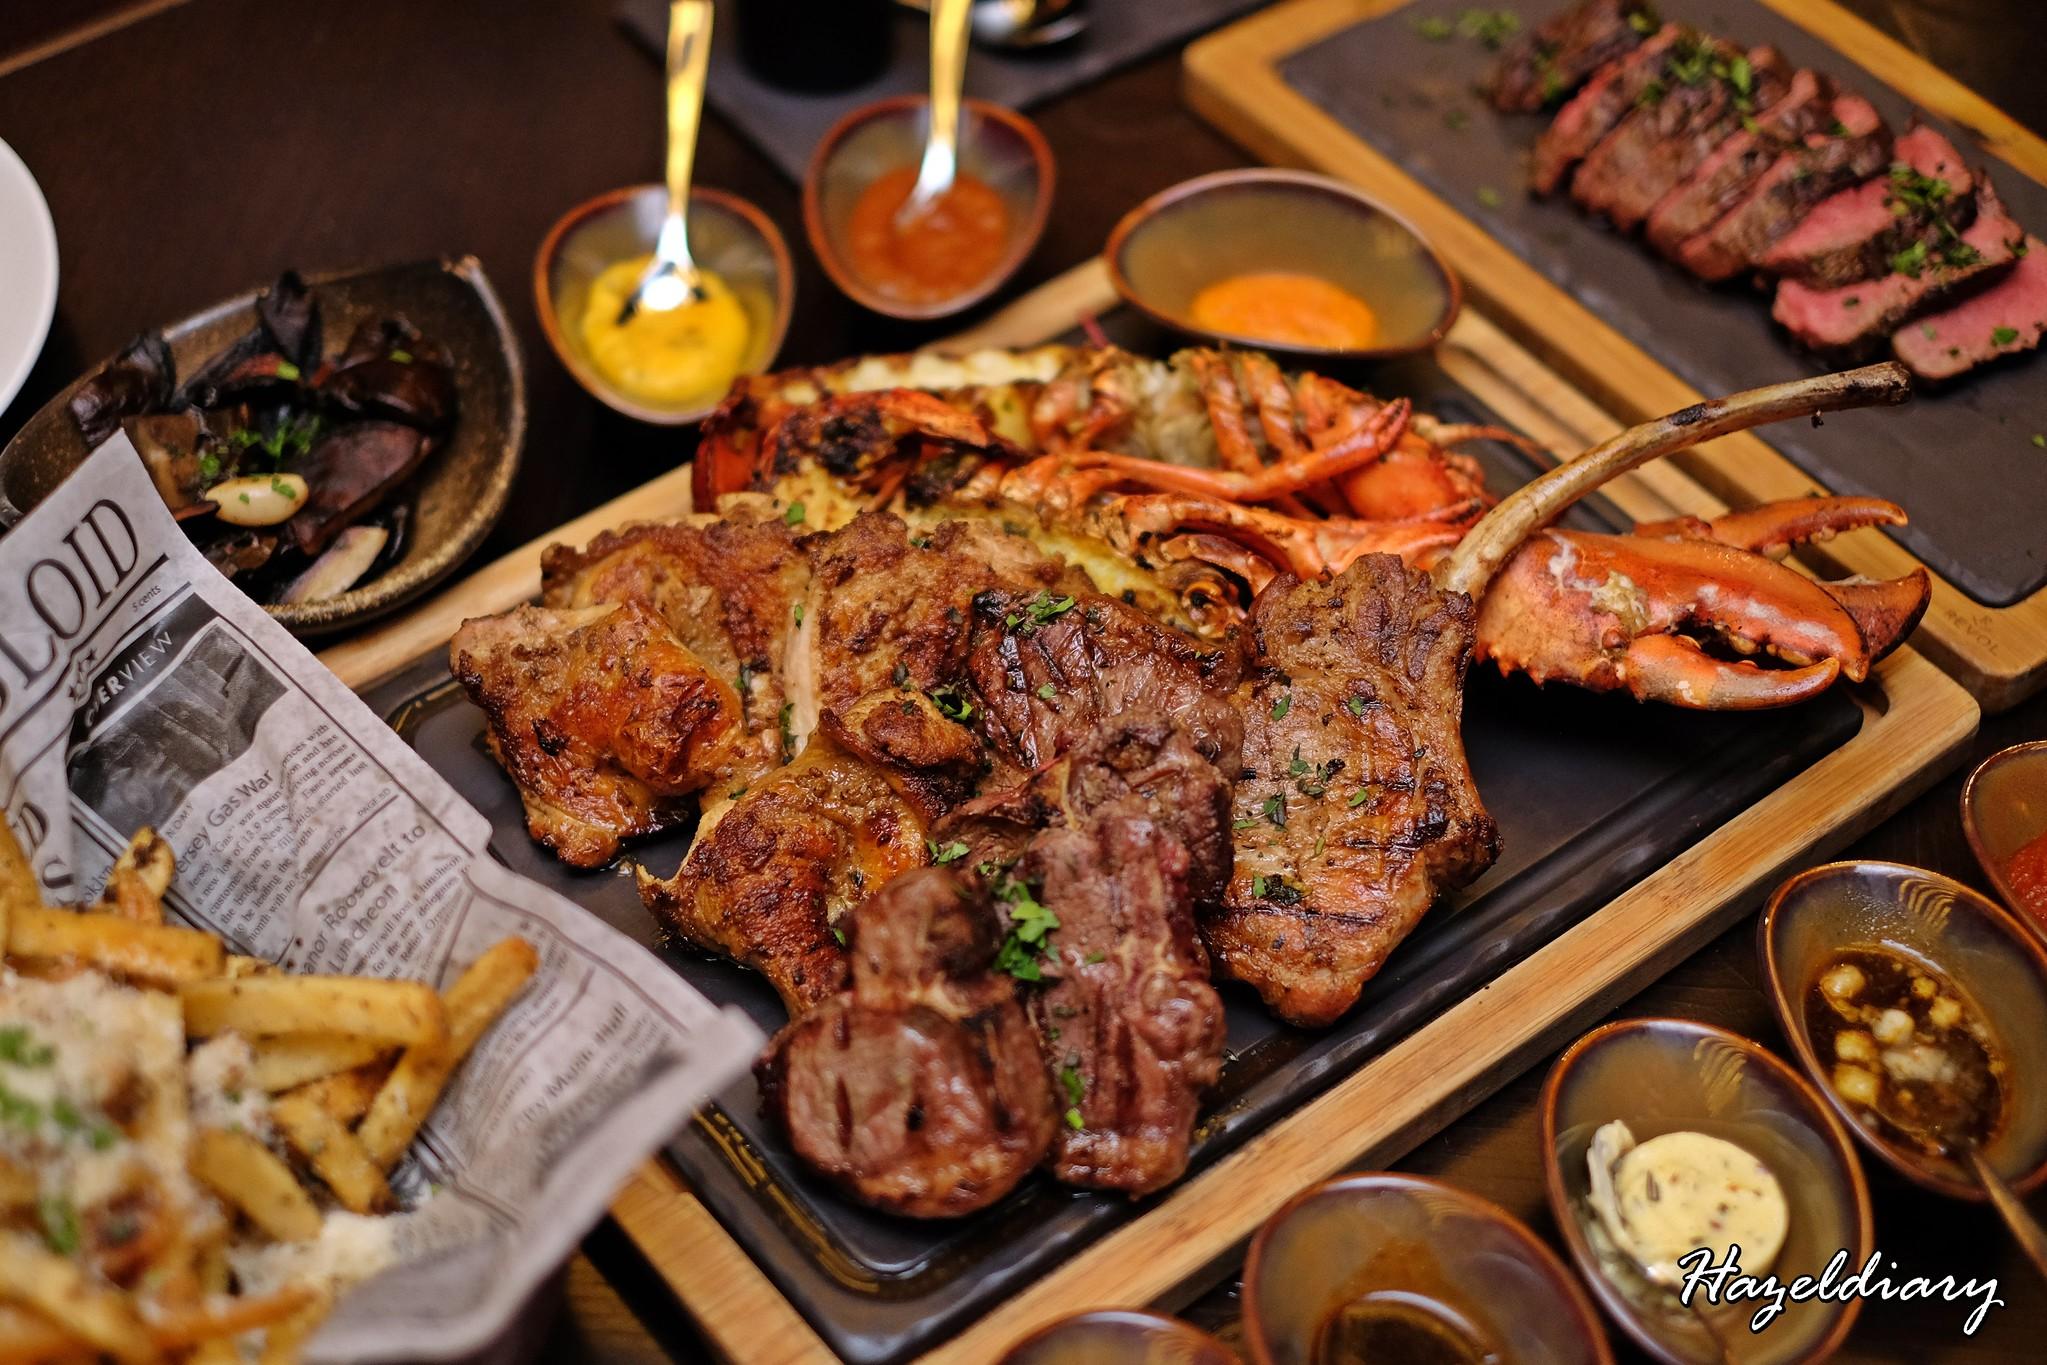 [SG EATS] Opus Bar & Grill At Hilton Singapore – New Menu, Premium Sharing Cut & Wine Deal (March Special)